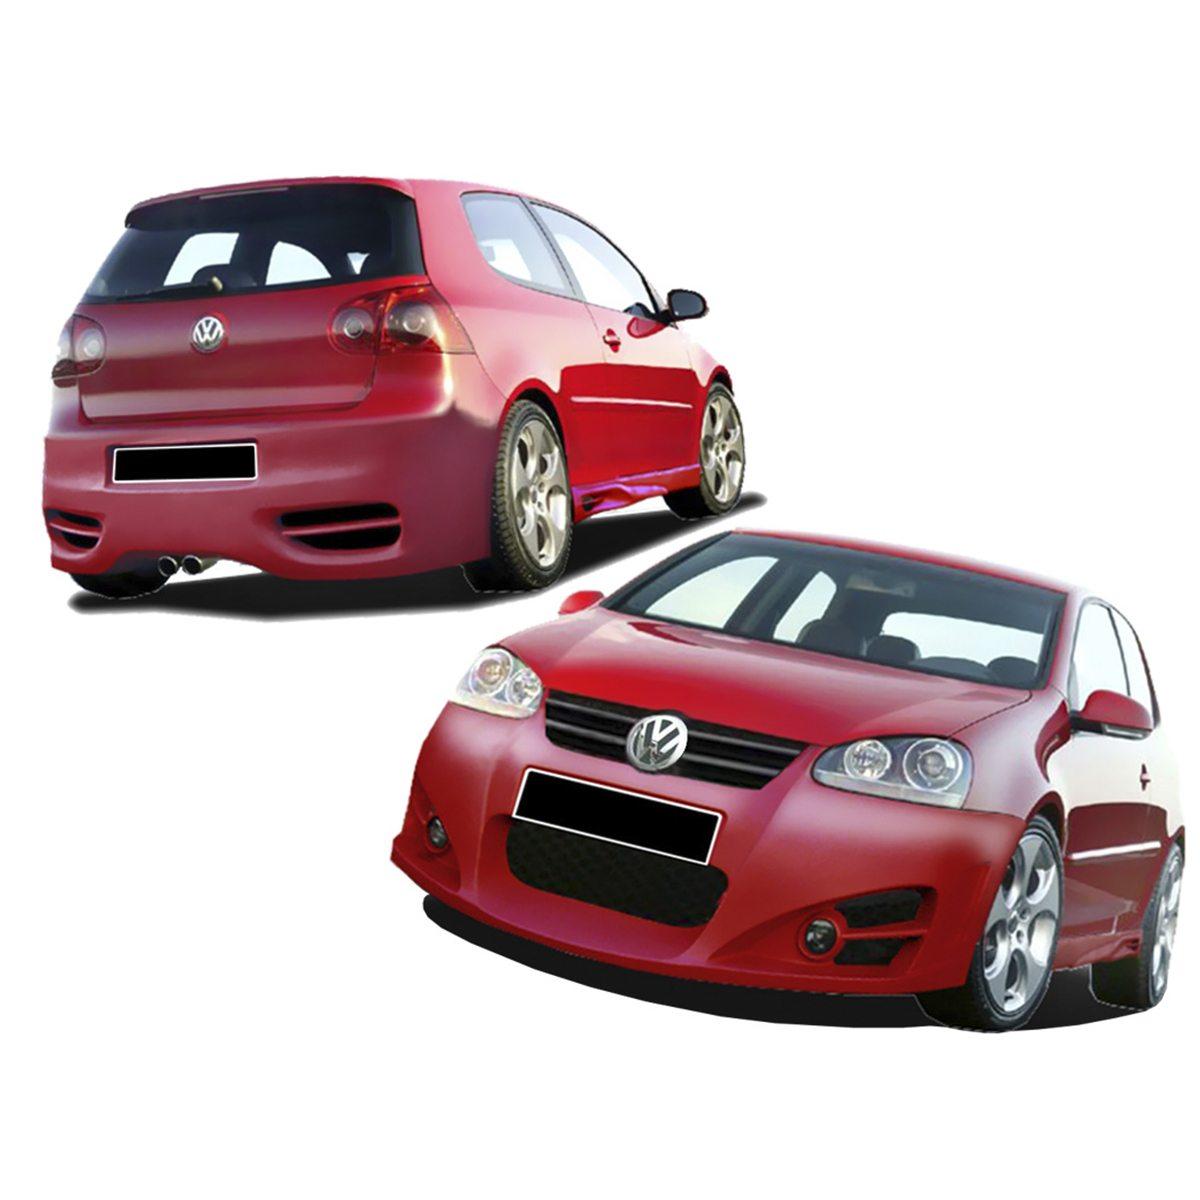 VW-Golf-V-Ghost-KIT-QTU033